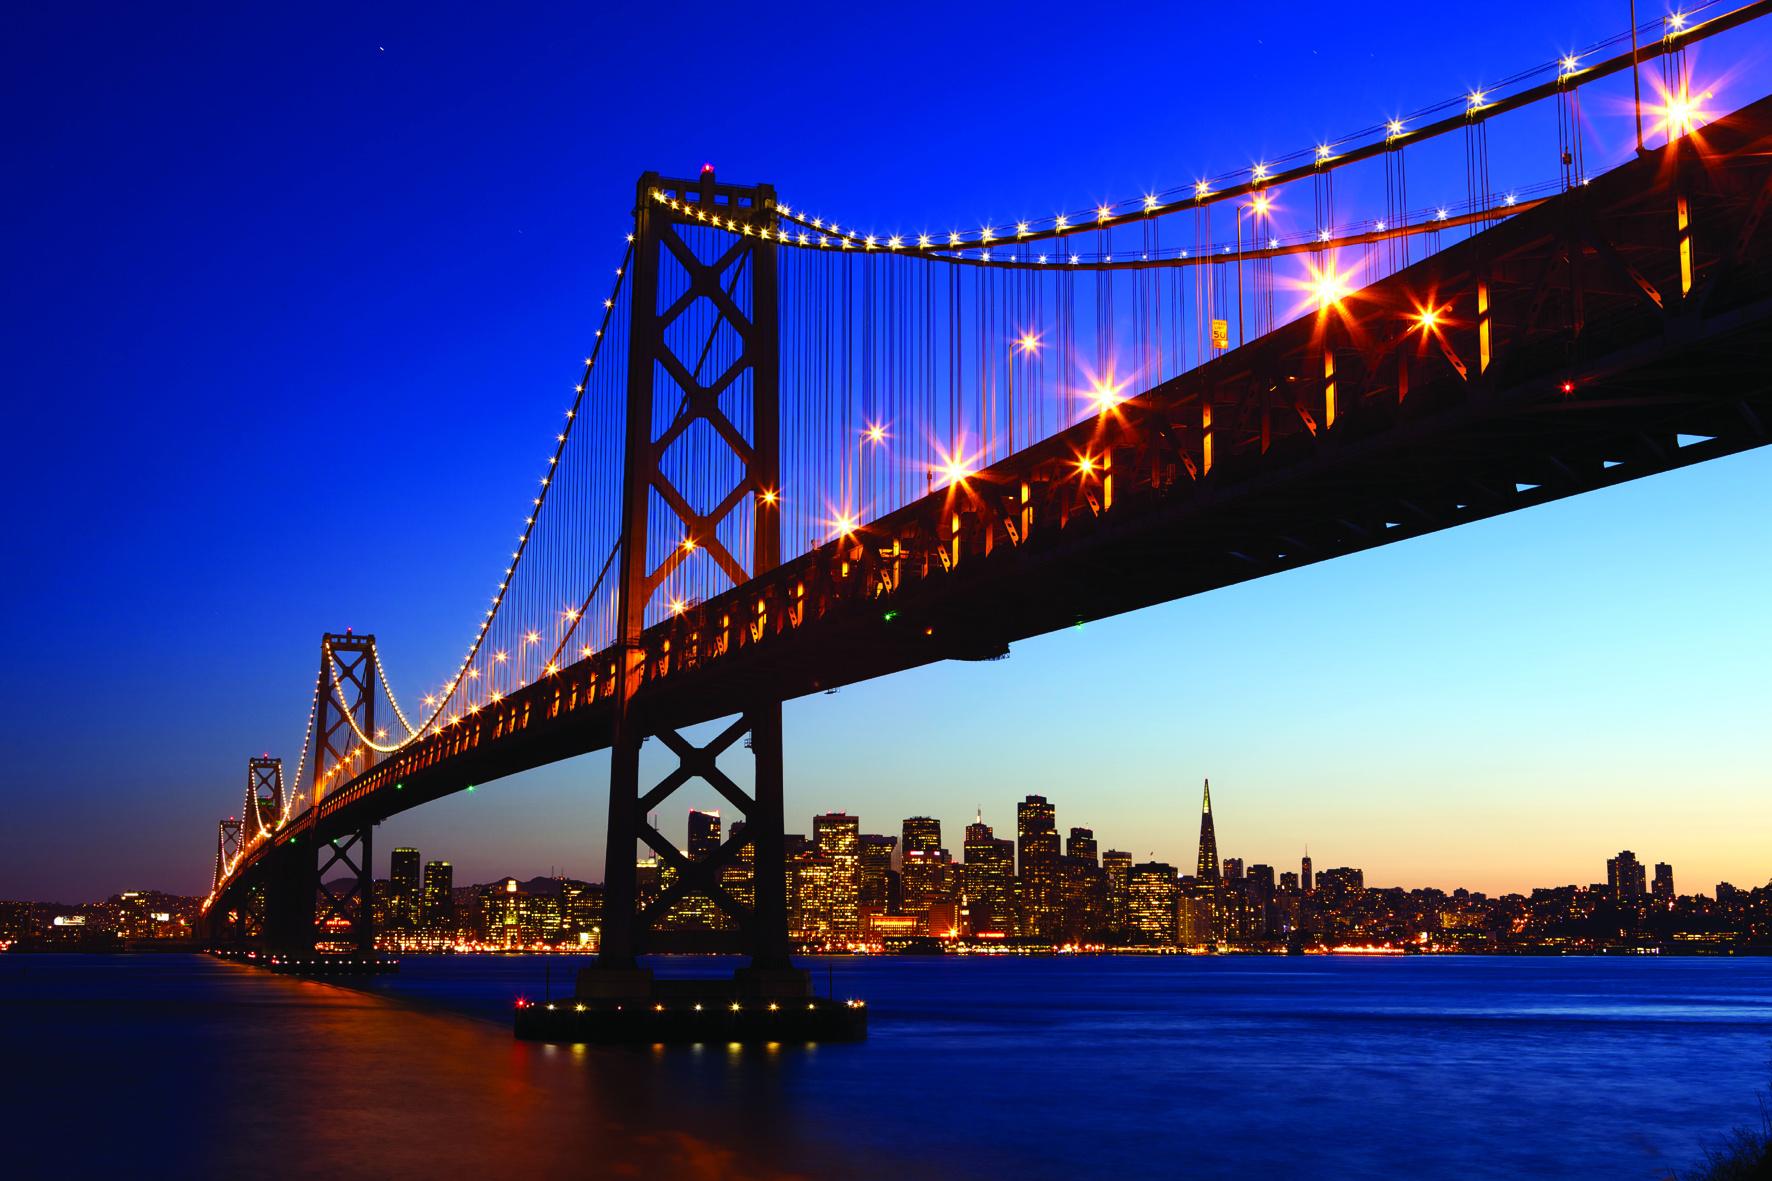 San Francisco sky